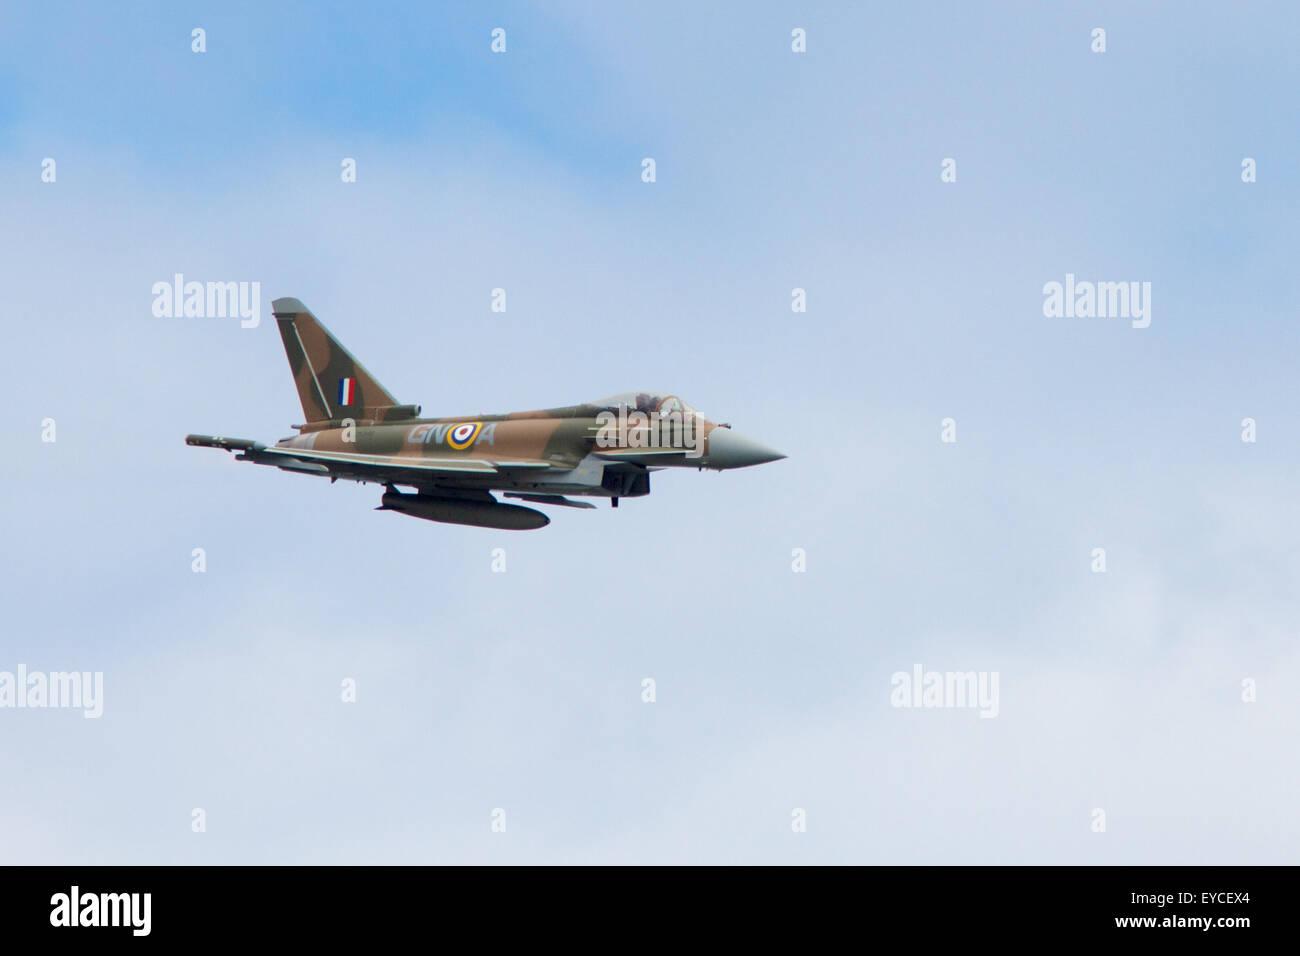 Sunderland, UK. 25th July, 2015. An FGR4 Typhoon Eurofighter flying at the Sunderland Airshow, July 2015 Credit: - Stock Image